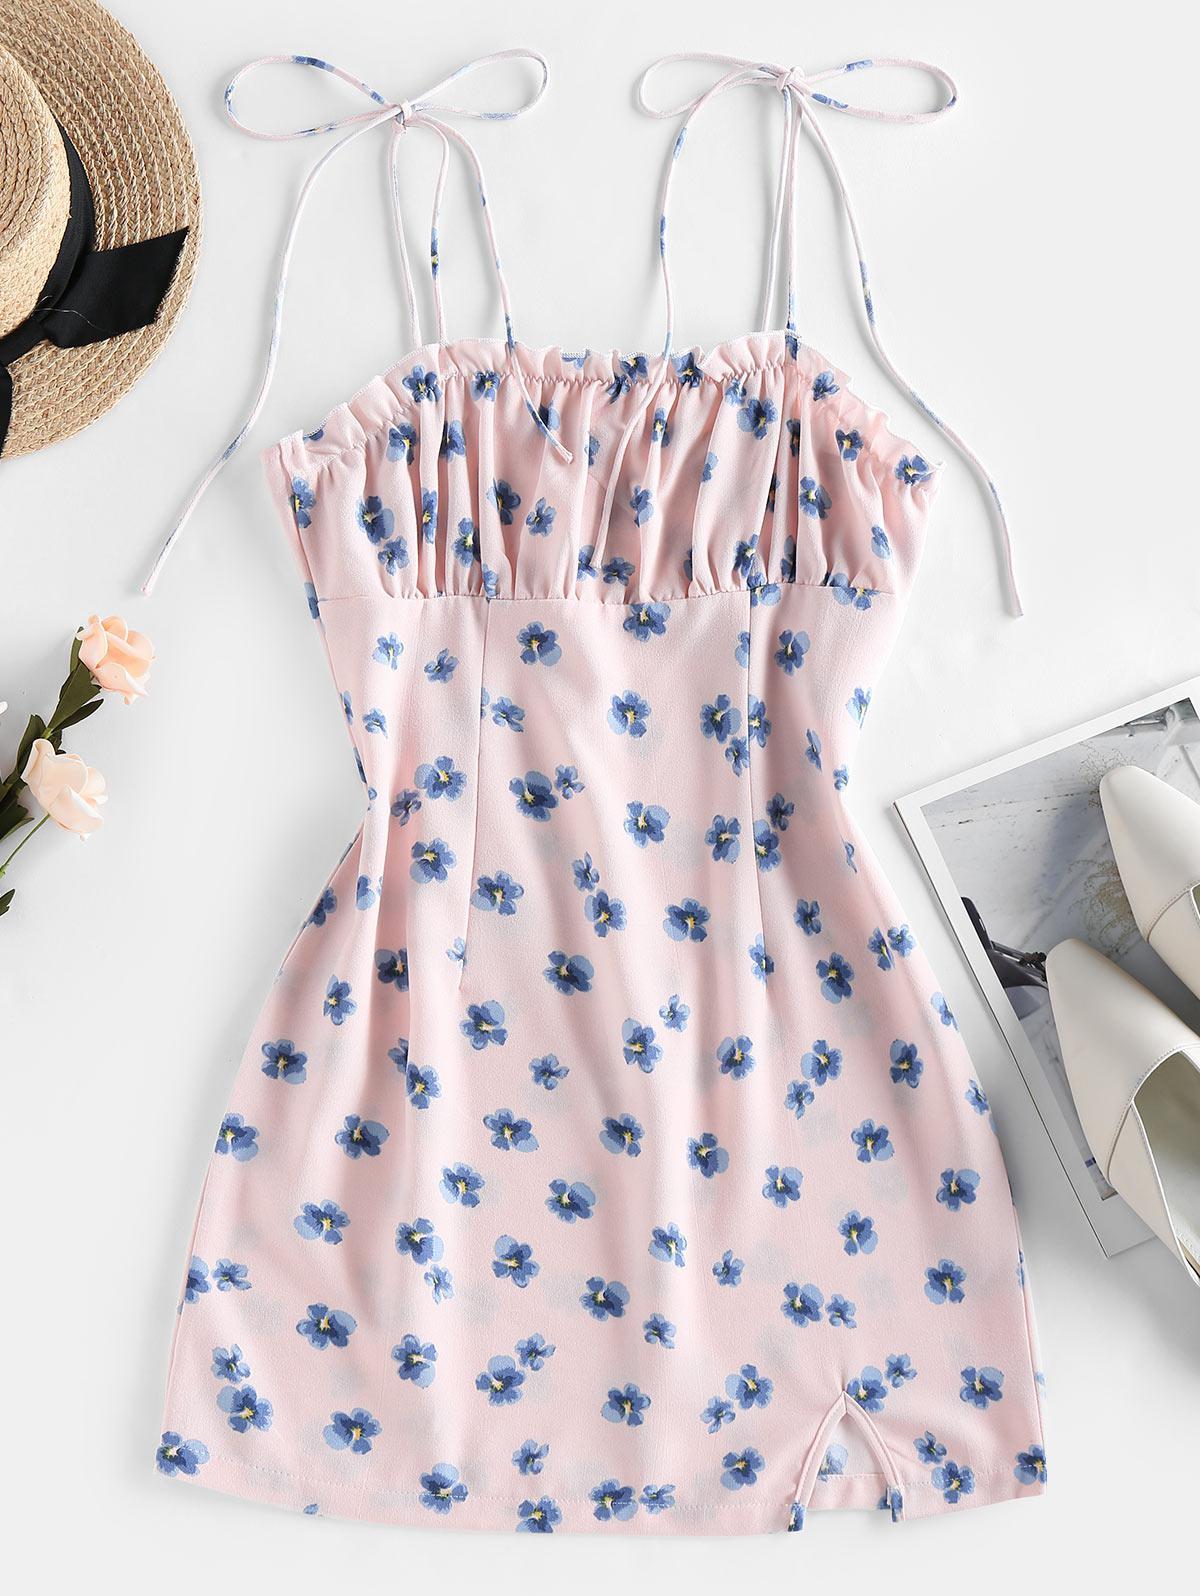 ZAFUL Floral Print Tie Shoulder Bodycon Dress